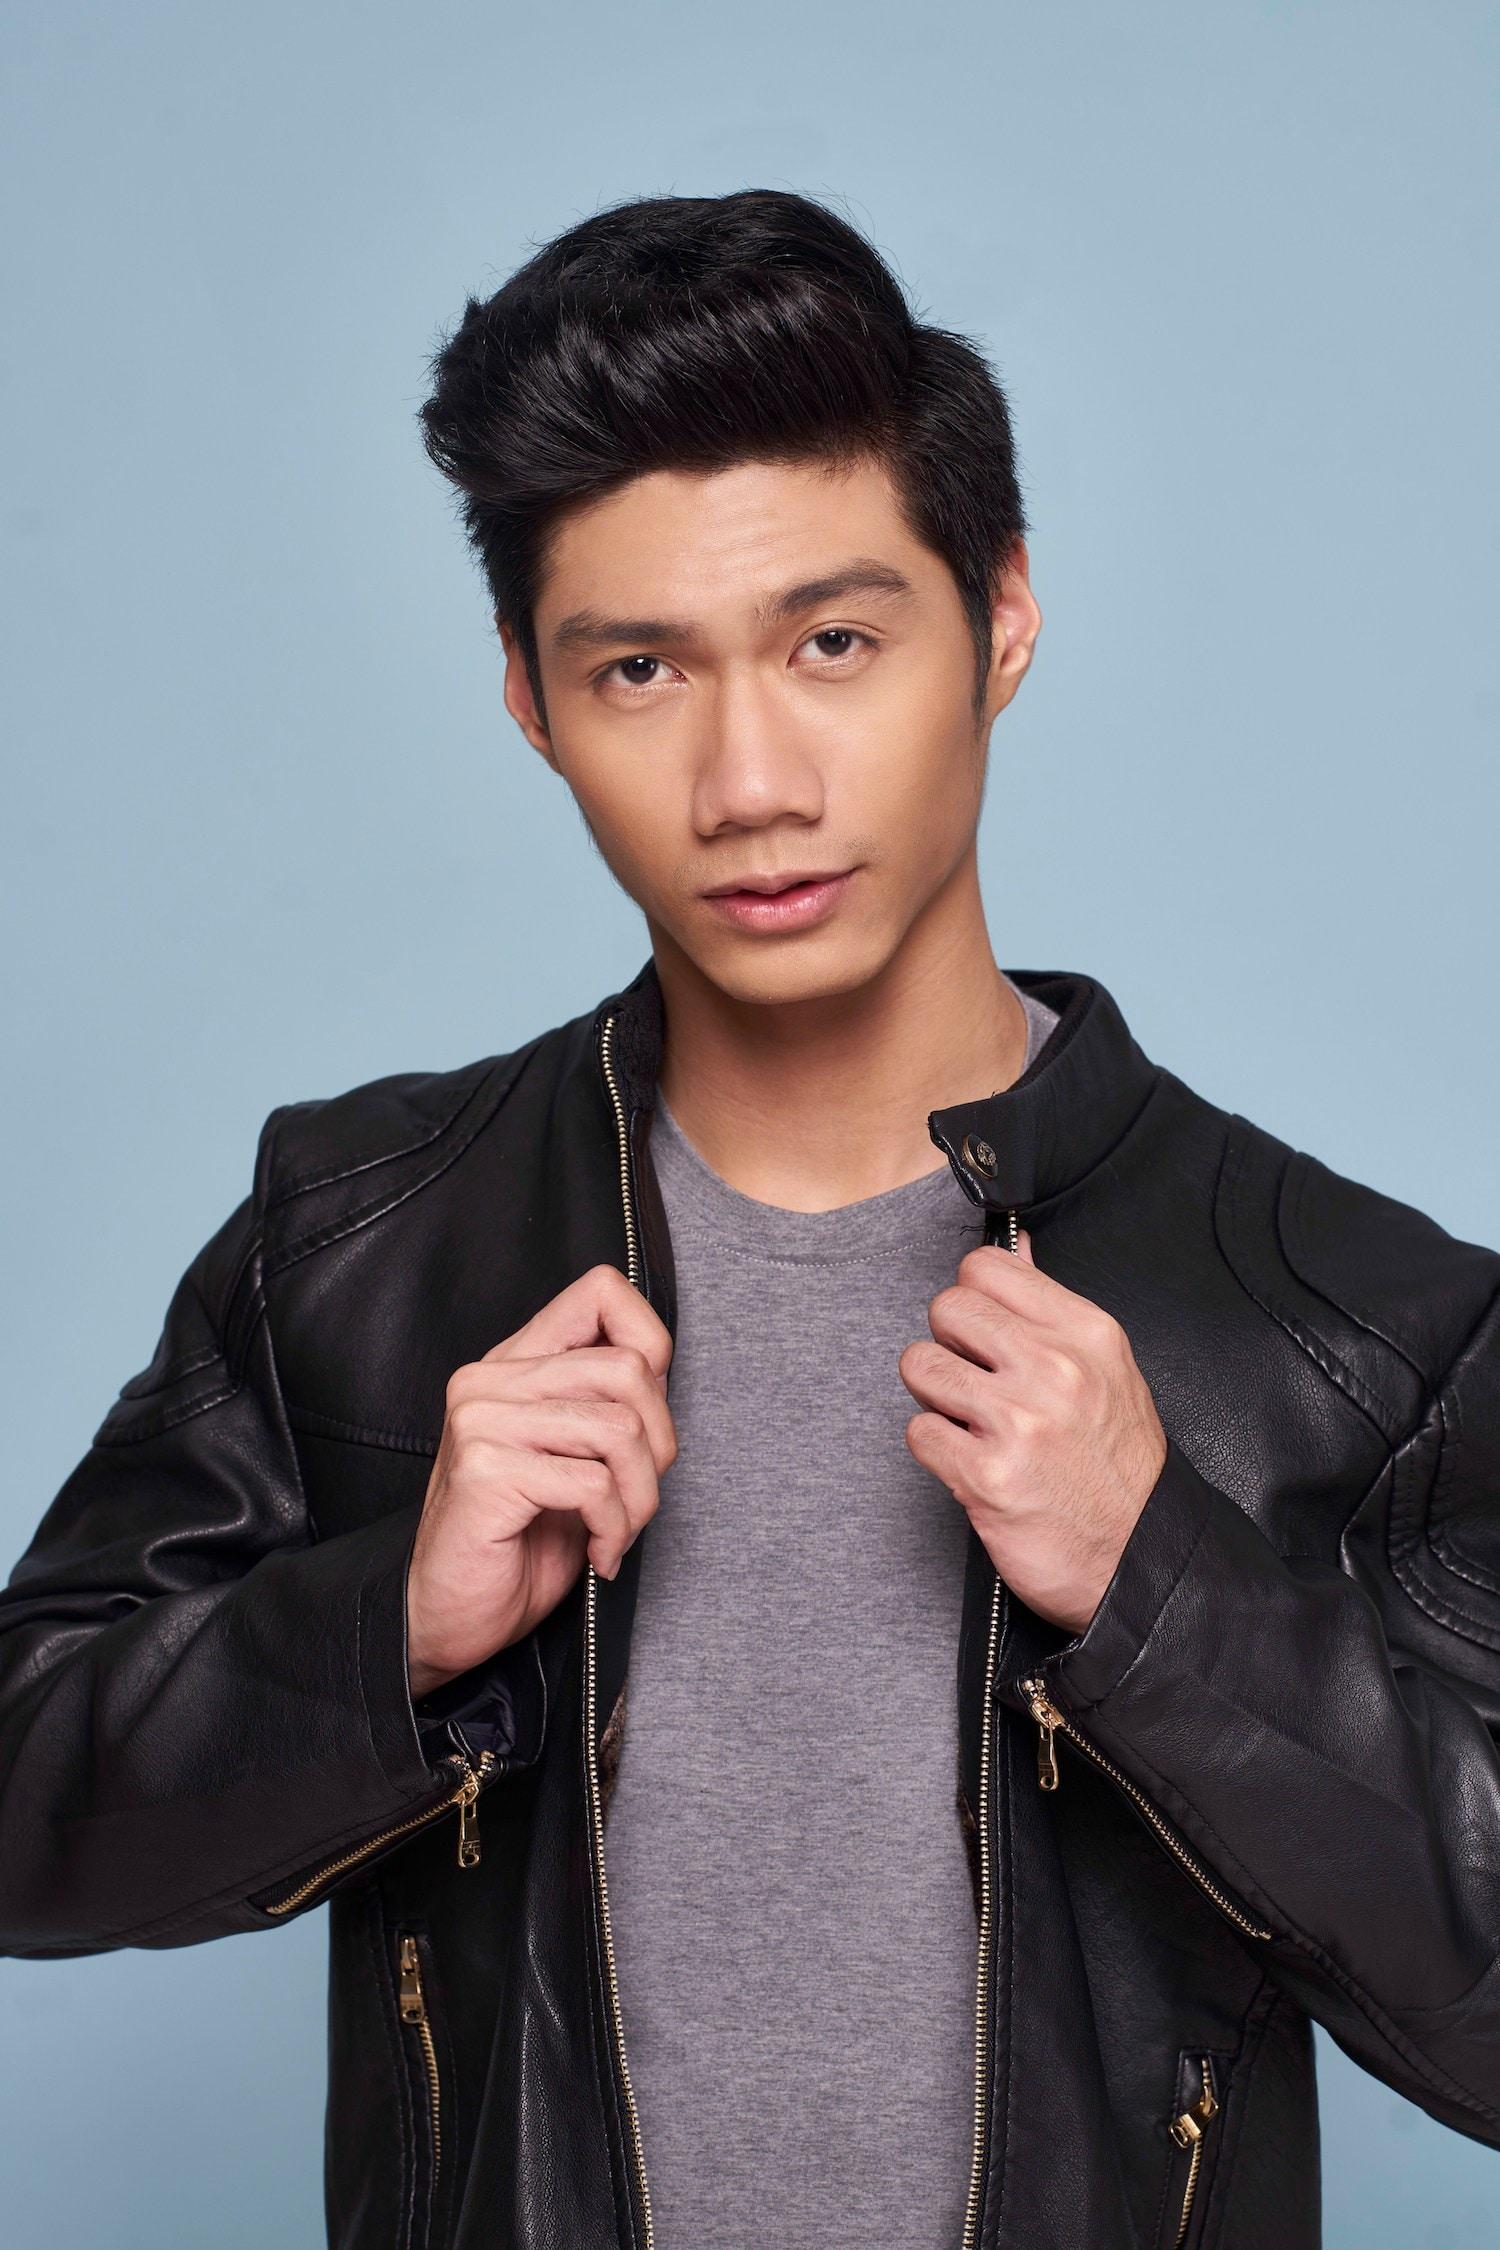 Pria Asia dengan rambut quiff.